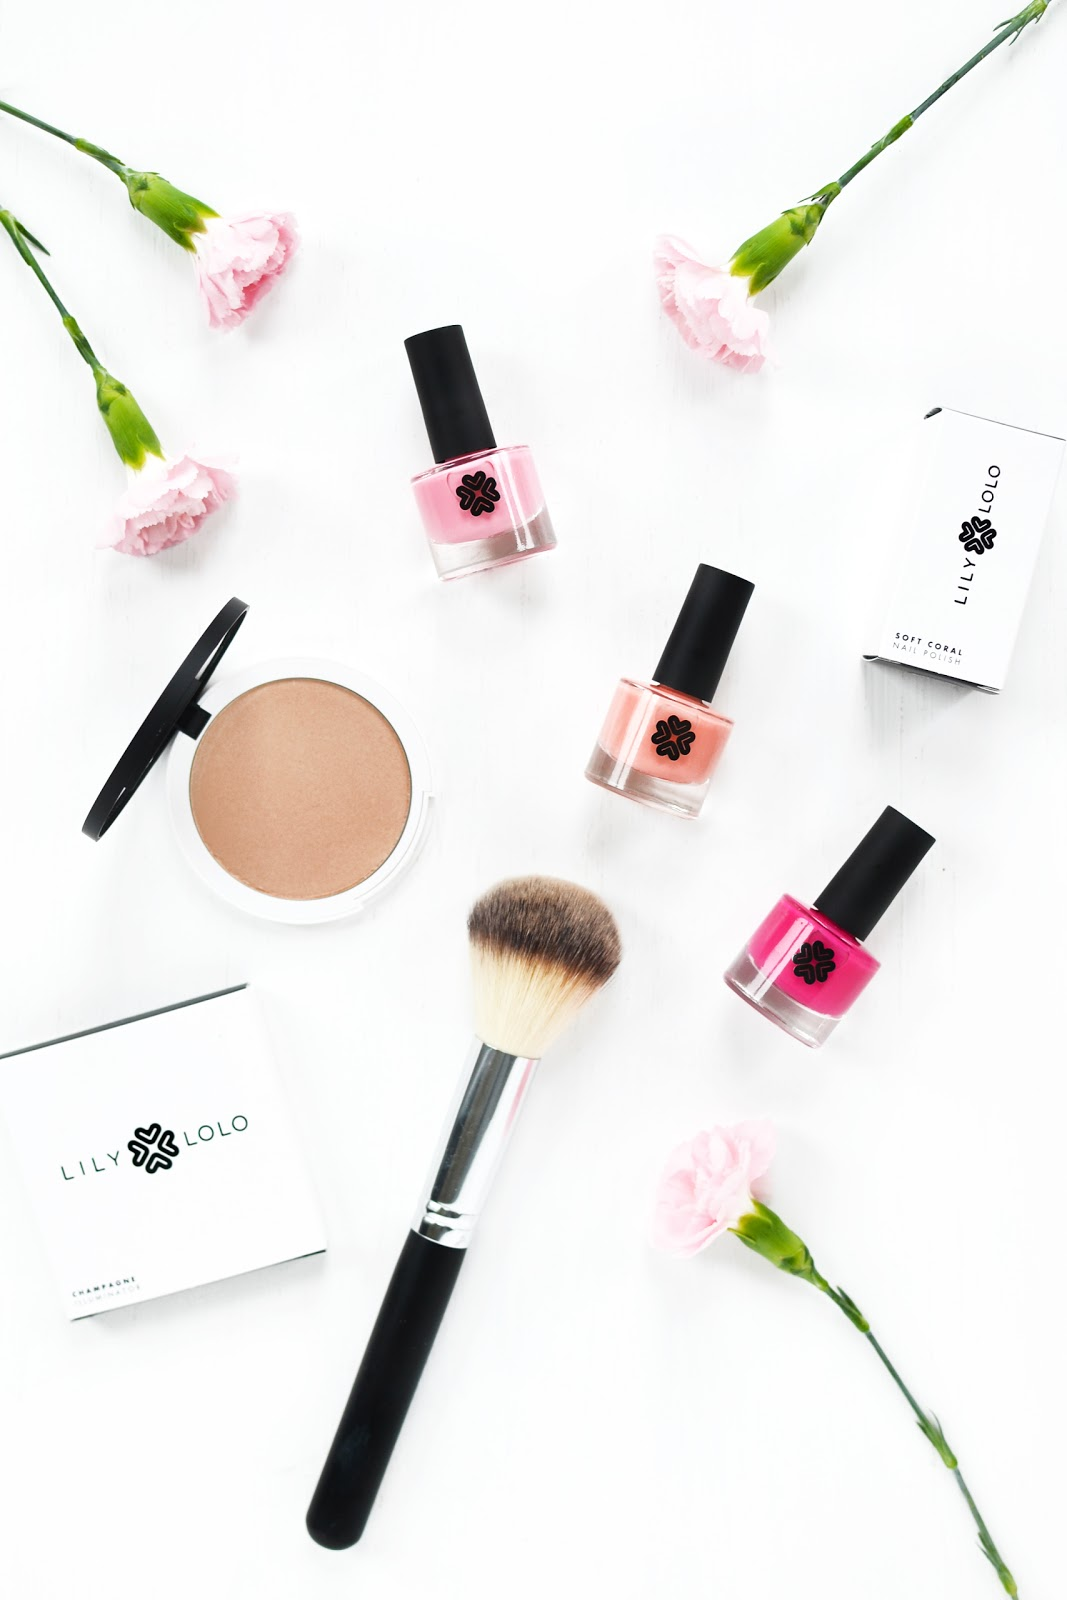 lily lolo british make up brand